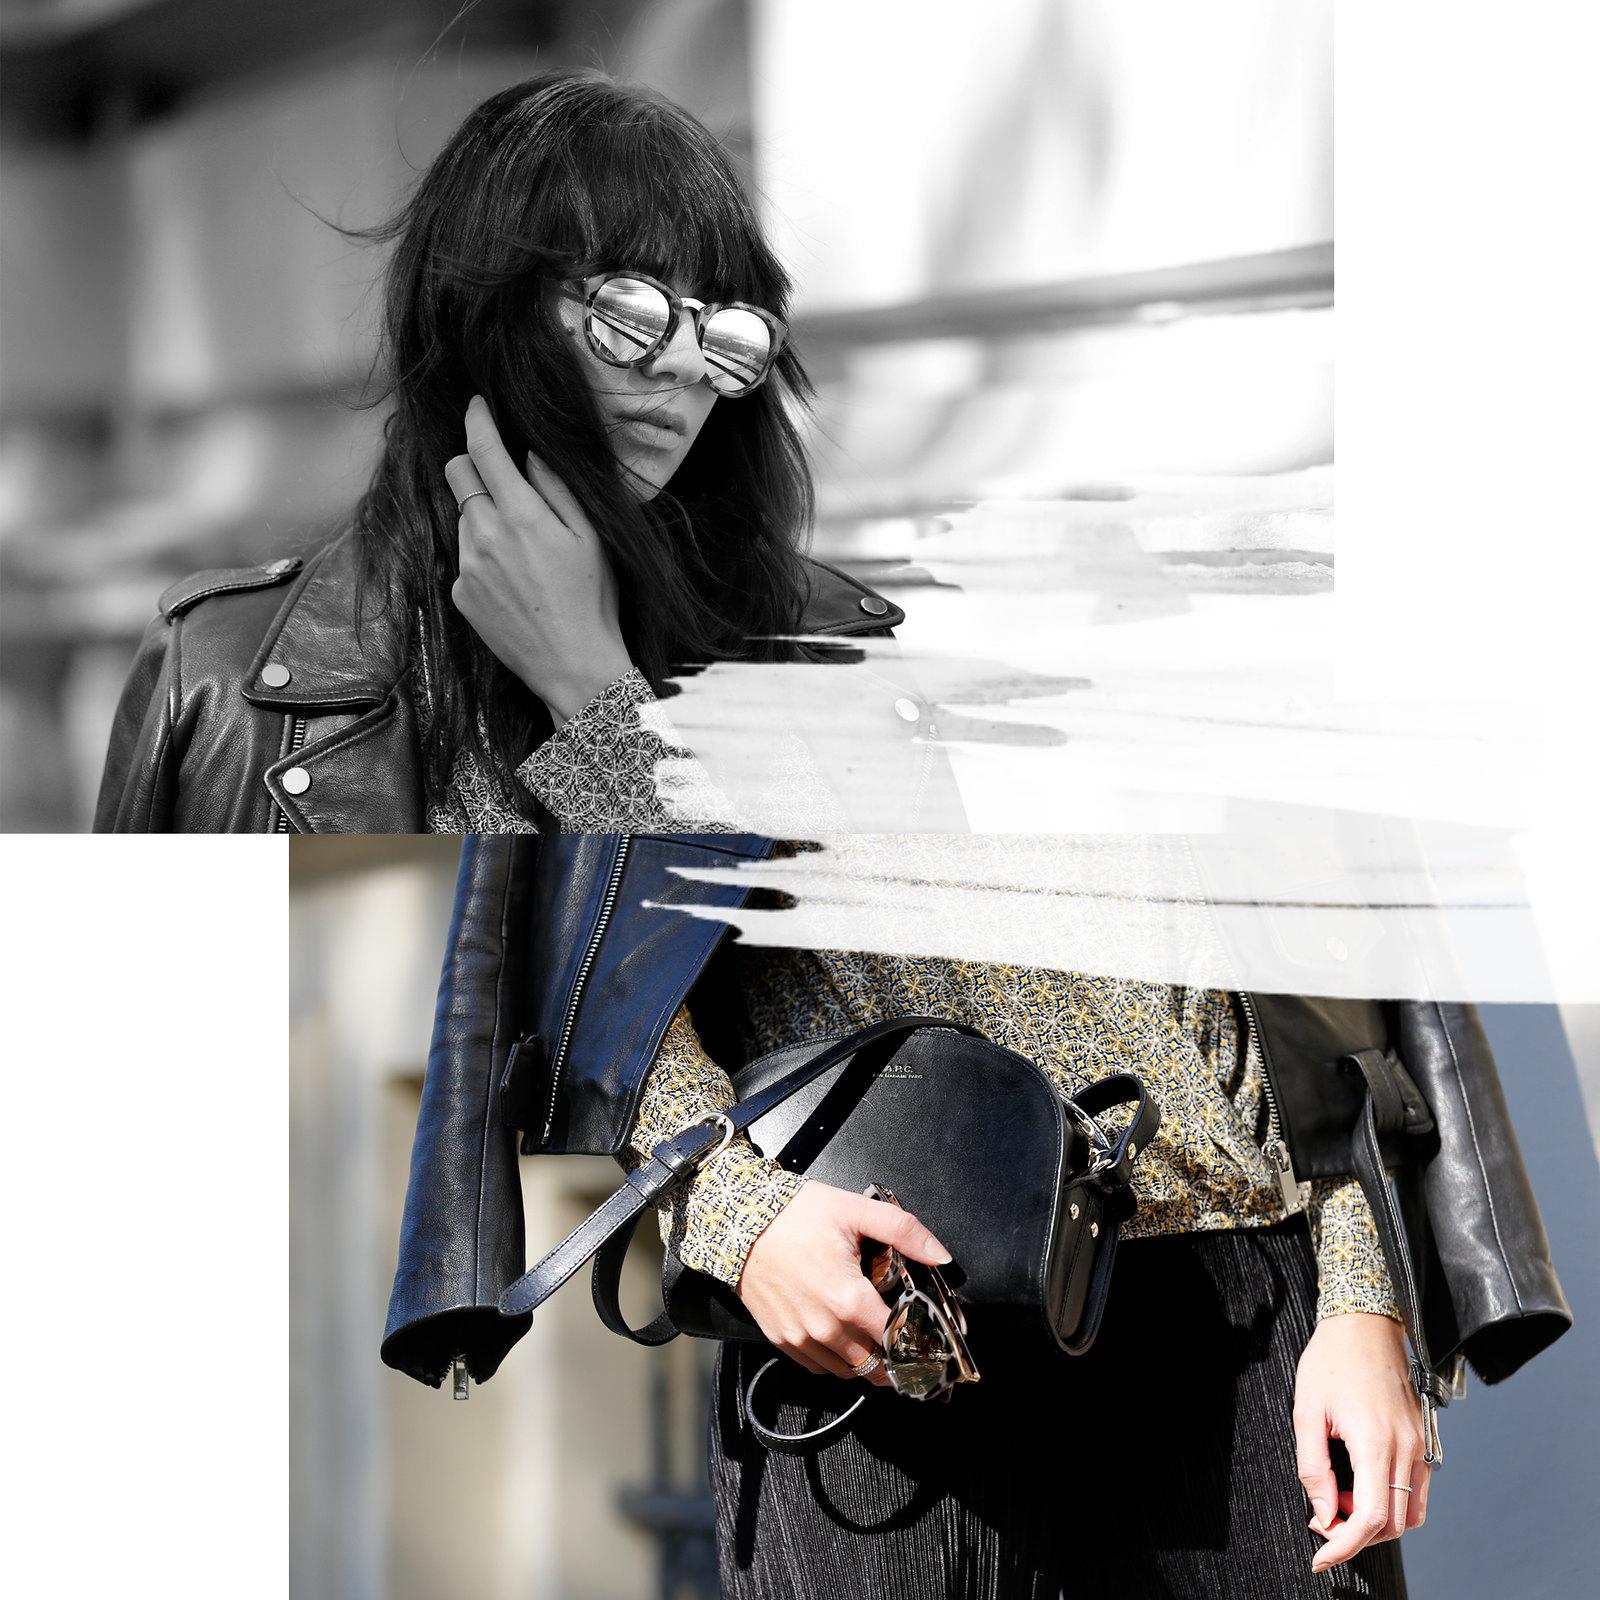 outfit ootd promod bluse herbst blouse shirt pattern muster lederjacke zara sonnenbrille sonne licht schatten cats & dogs fashion blog ricarda schernus modeblogger berlin blogger düsseldorf 1